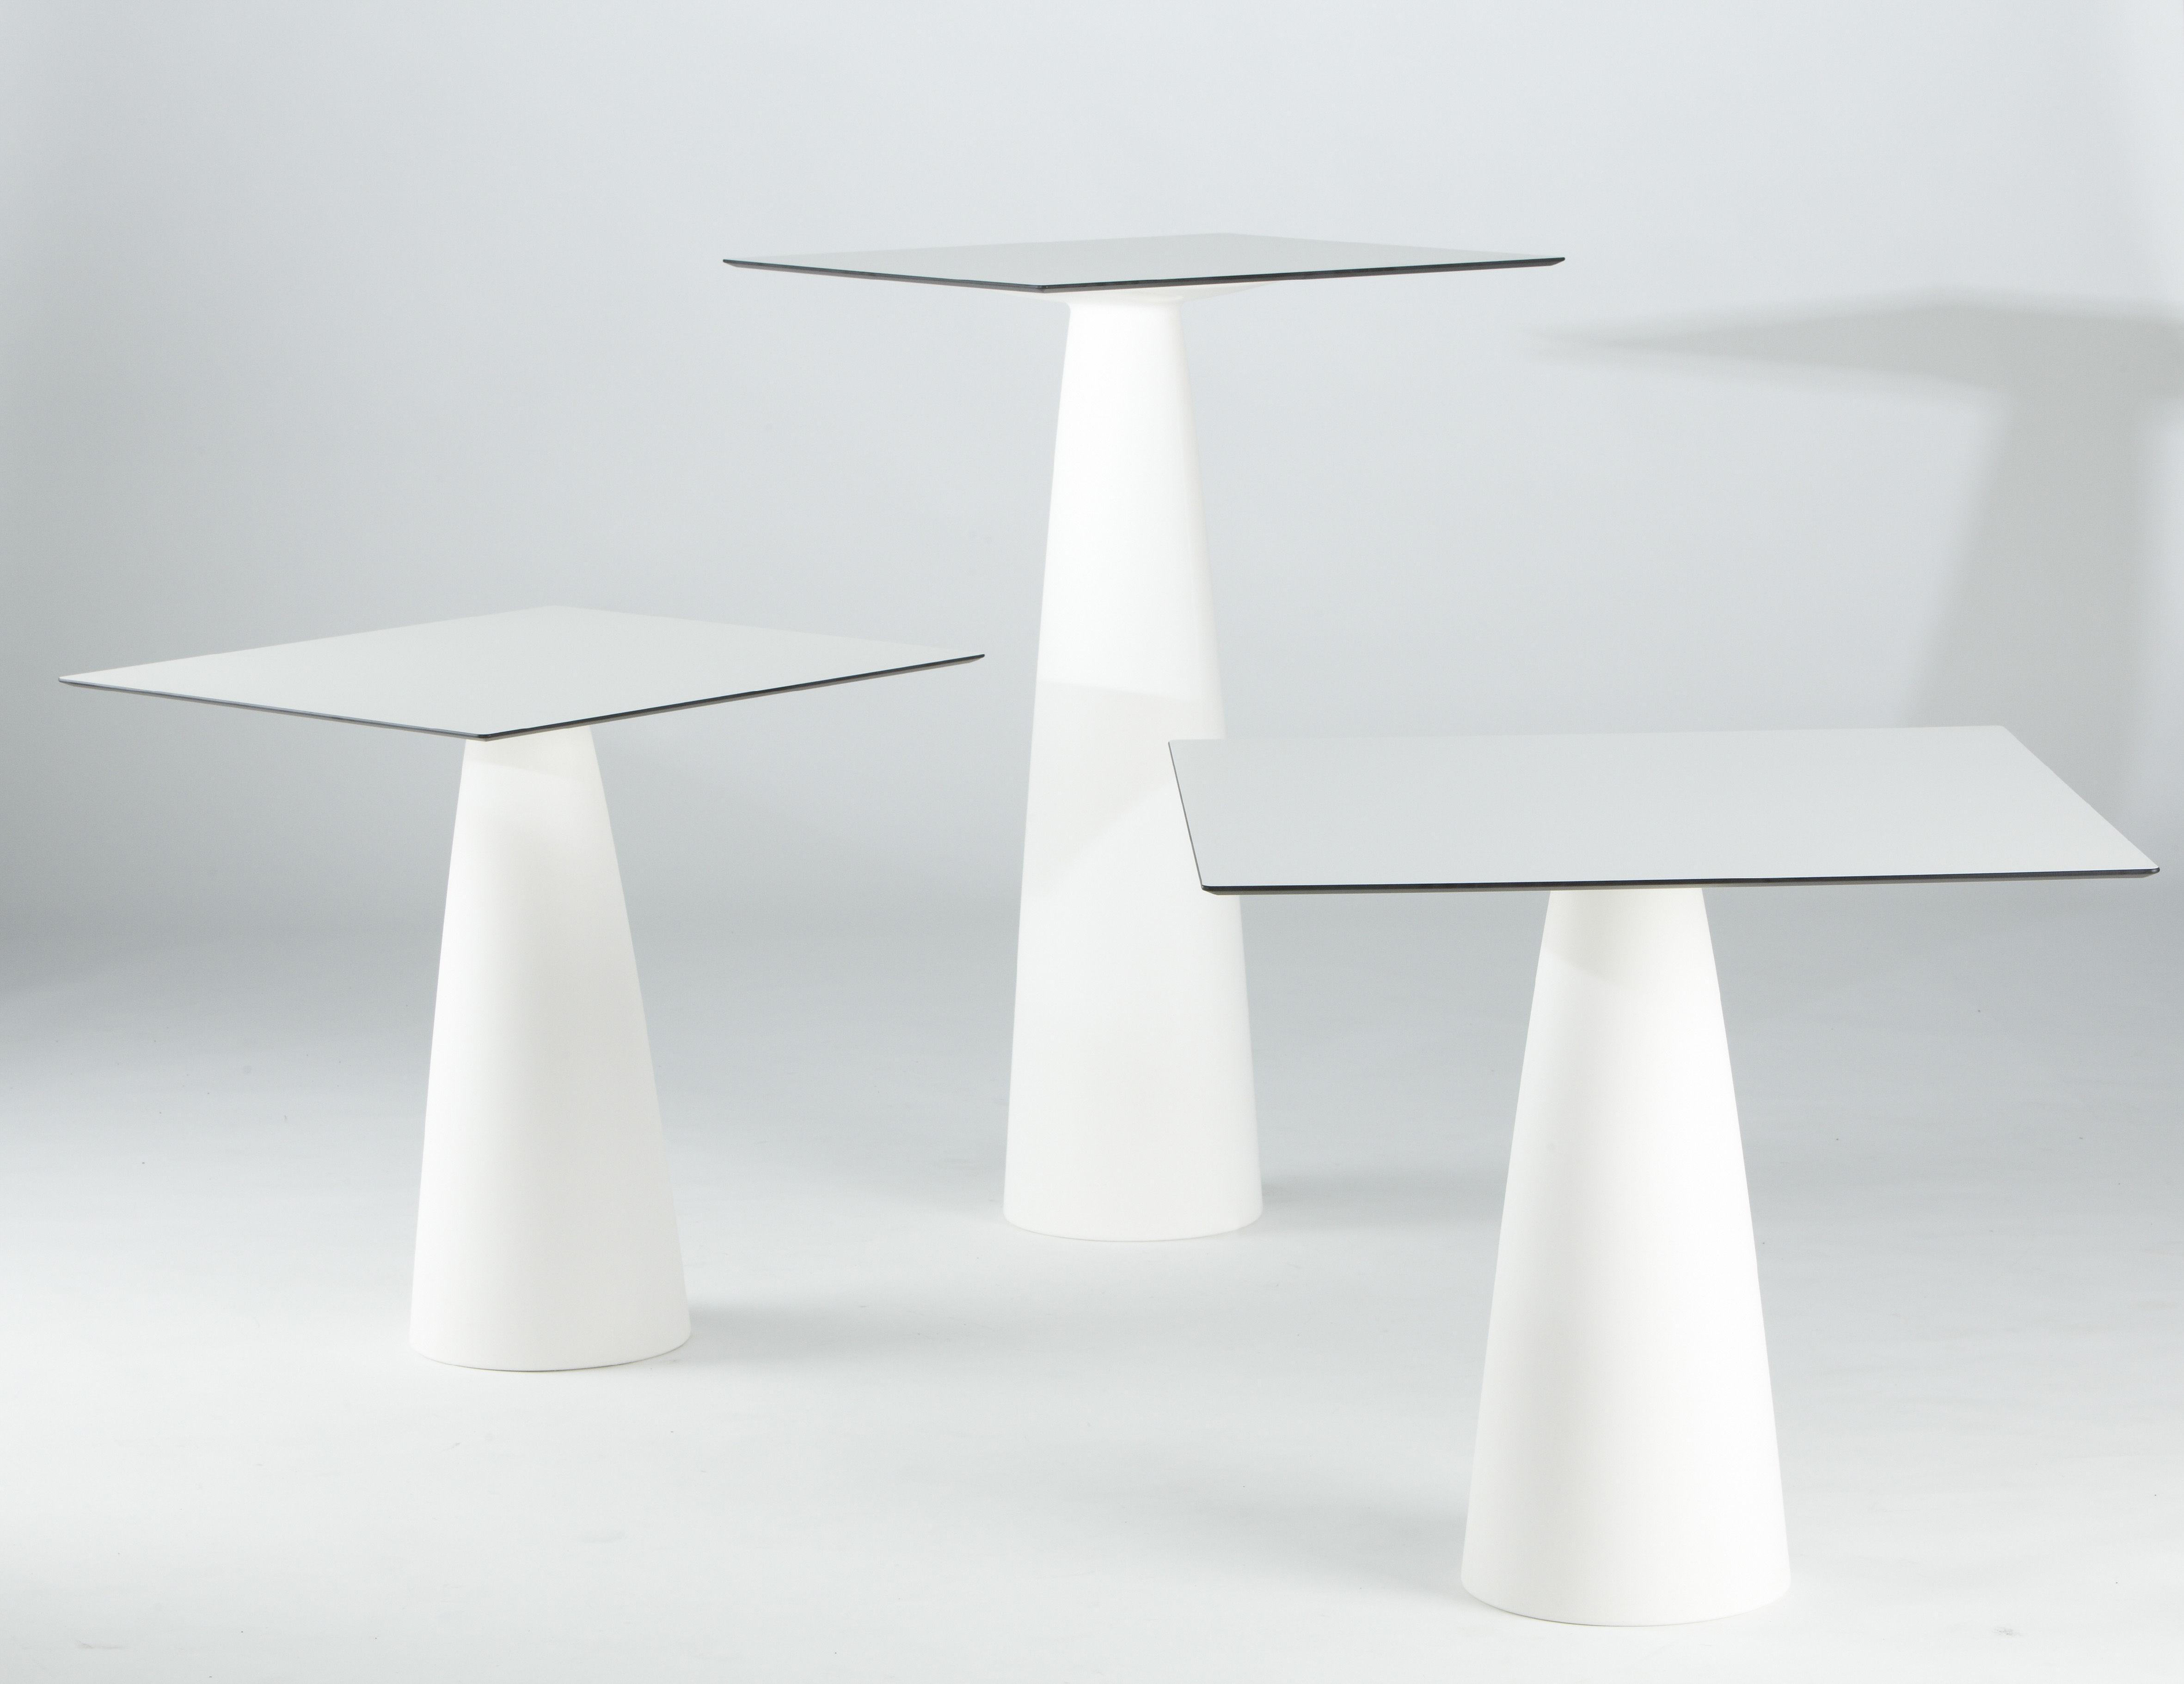 Tavoli Alti Bar : Hoplà h cm tavolo bar alto cm cm